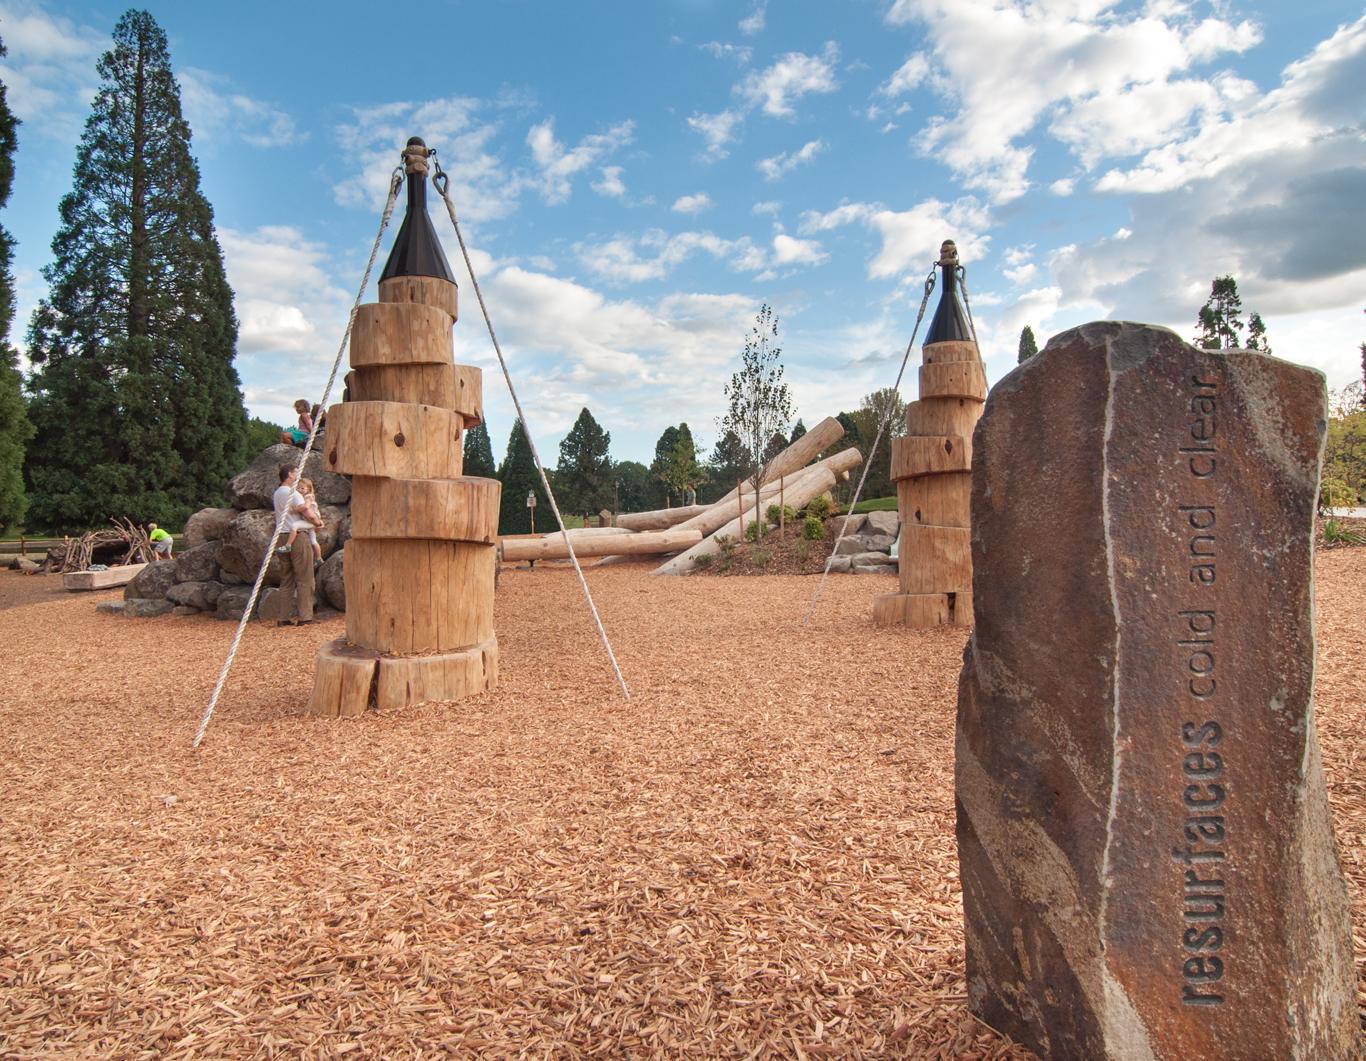 Westmoreland nature-based play area